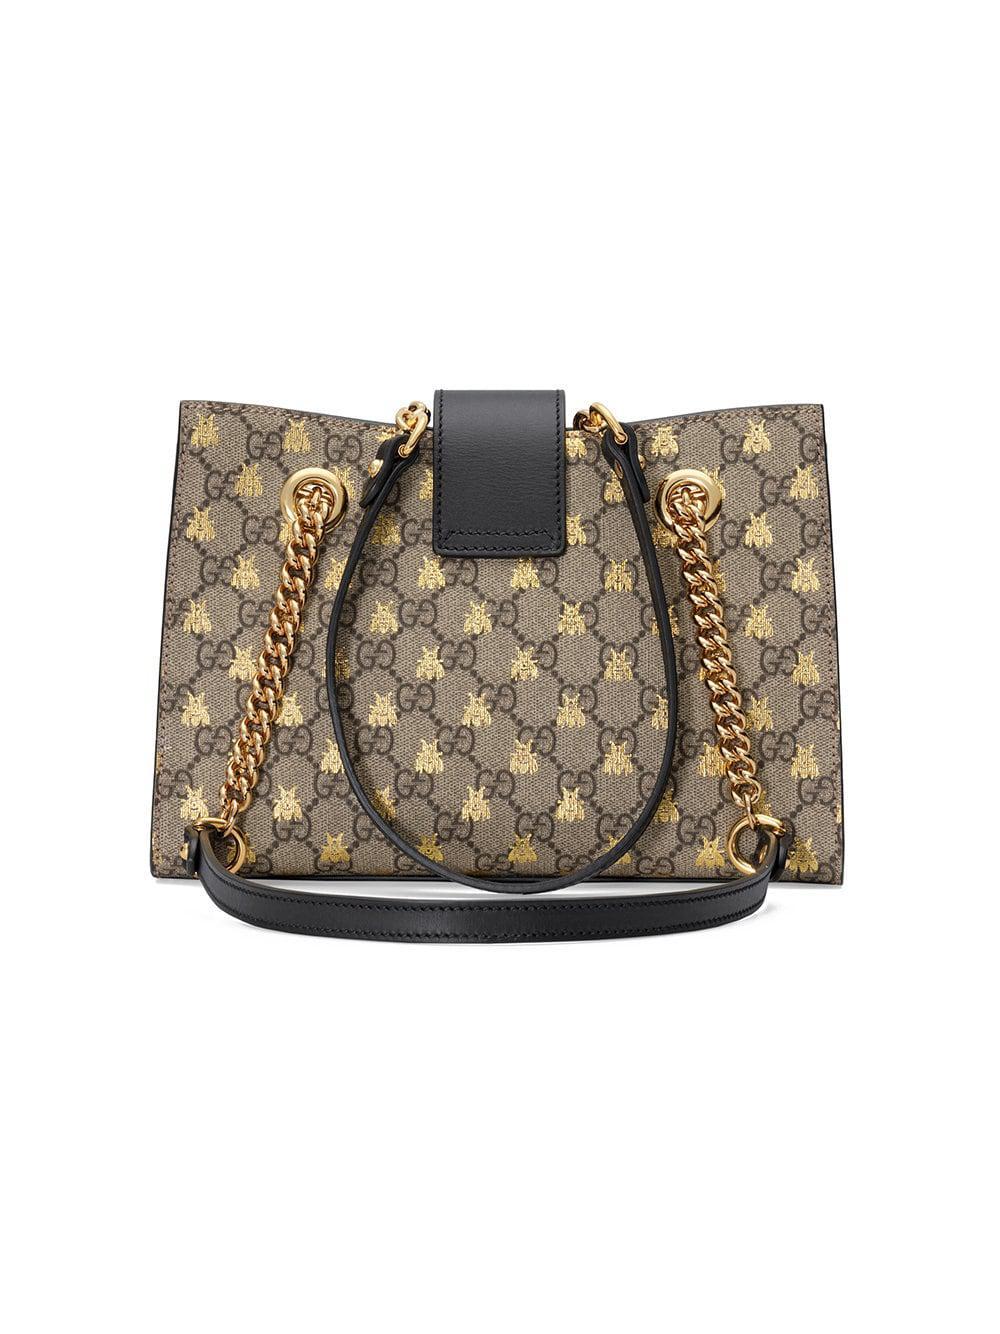 be5ba6bba0e0 Gucci - Multicolor Padlock Small GG Bees Shoulder Bag - Lyst. View  fullscreen